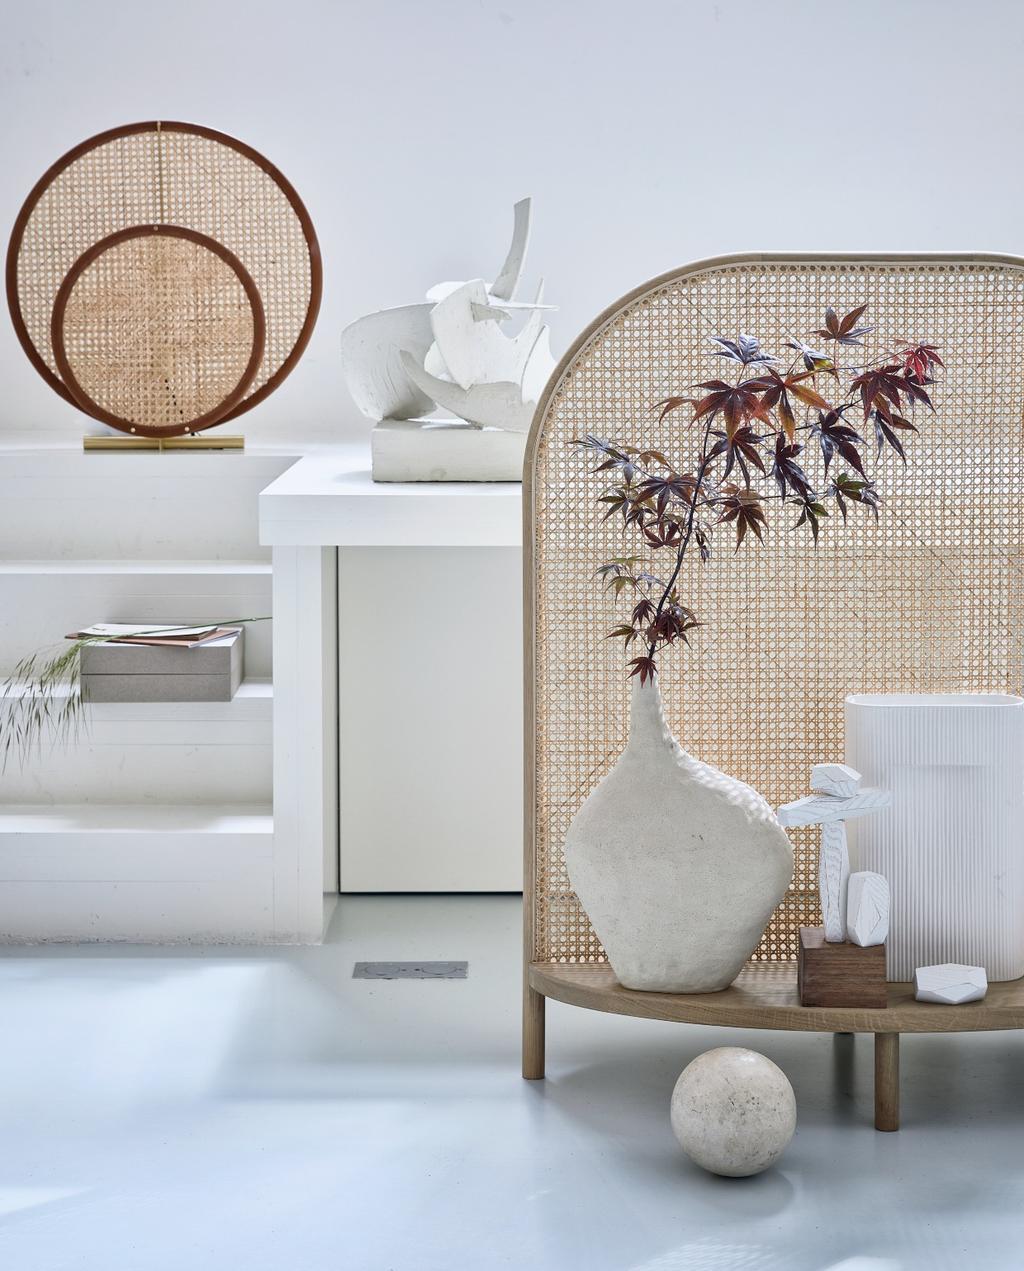 vtwonen 08-2020 | styling Scandinavisch eikenhout kamerscherm met witte vazen